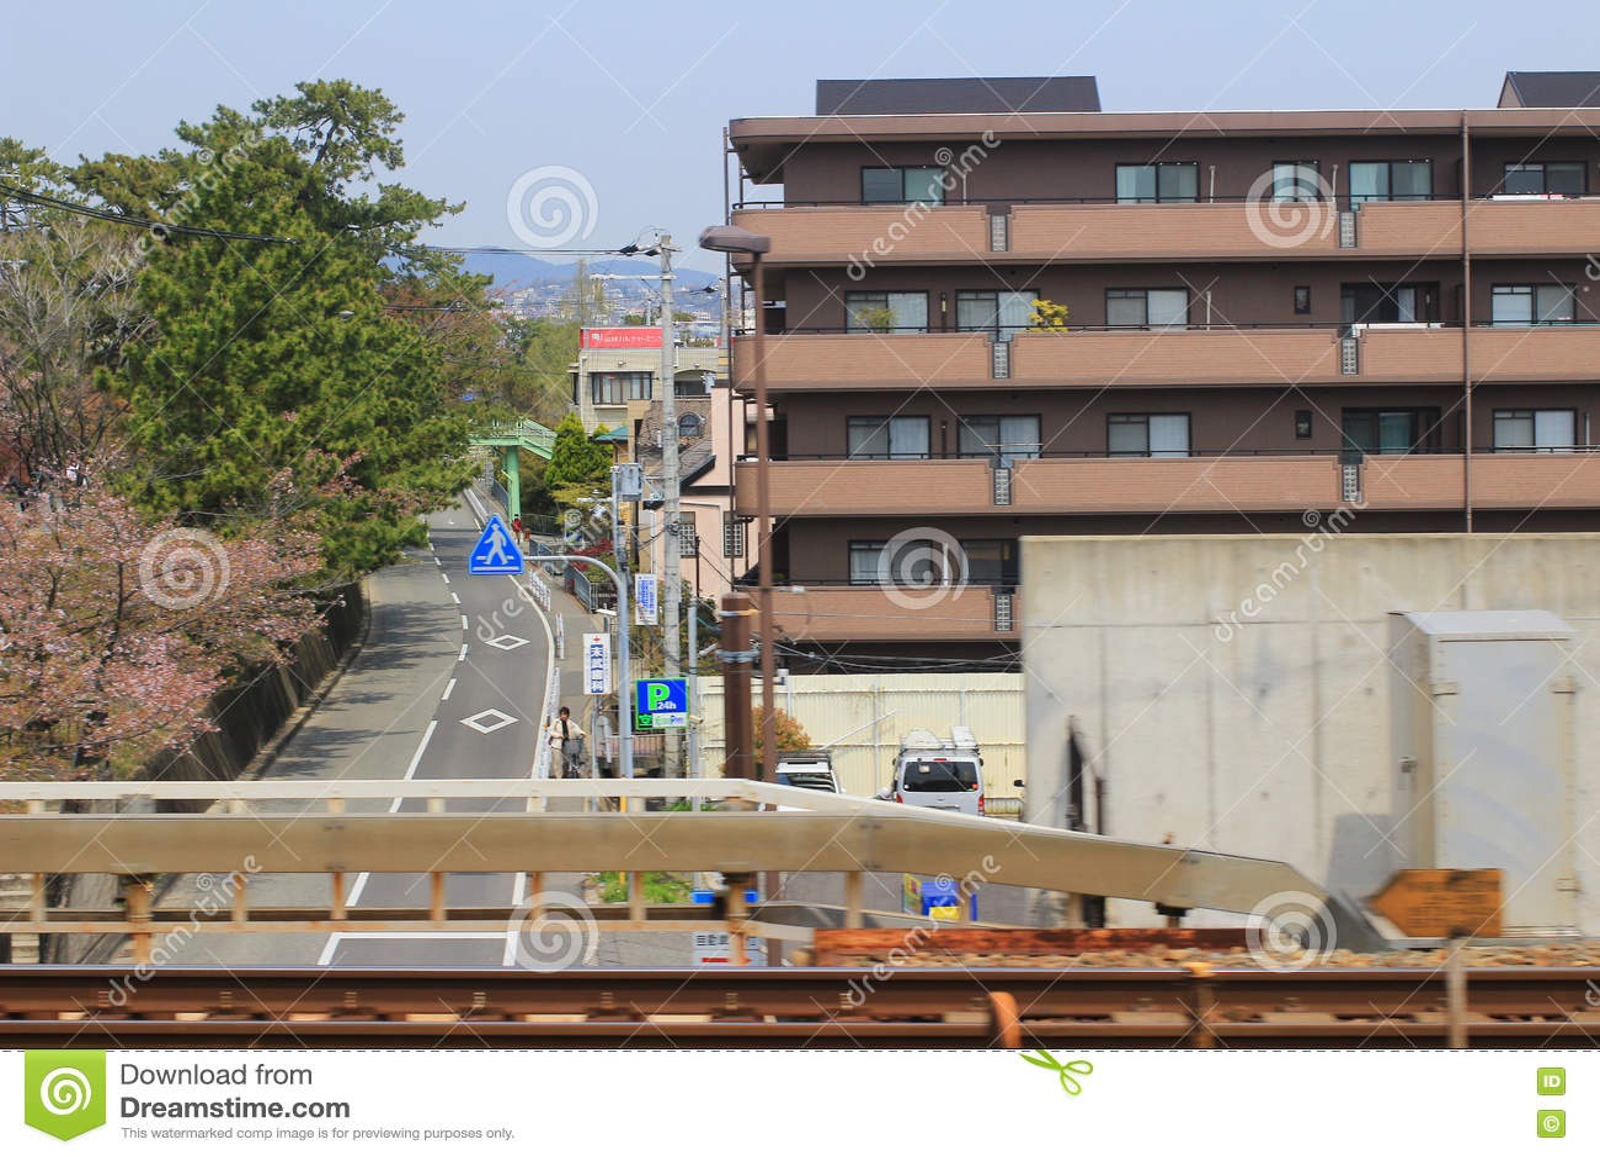 Osaka To Kobe View Out Of Train Stock Image - Image of train